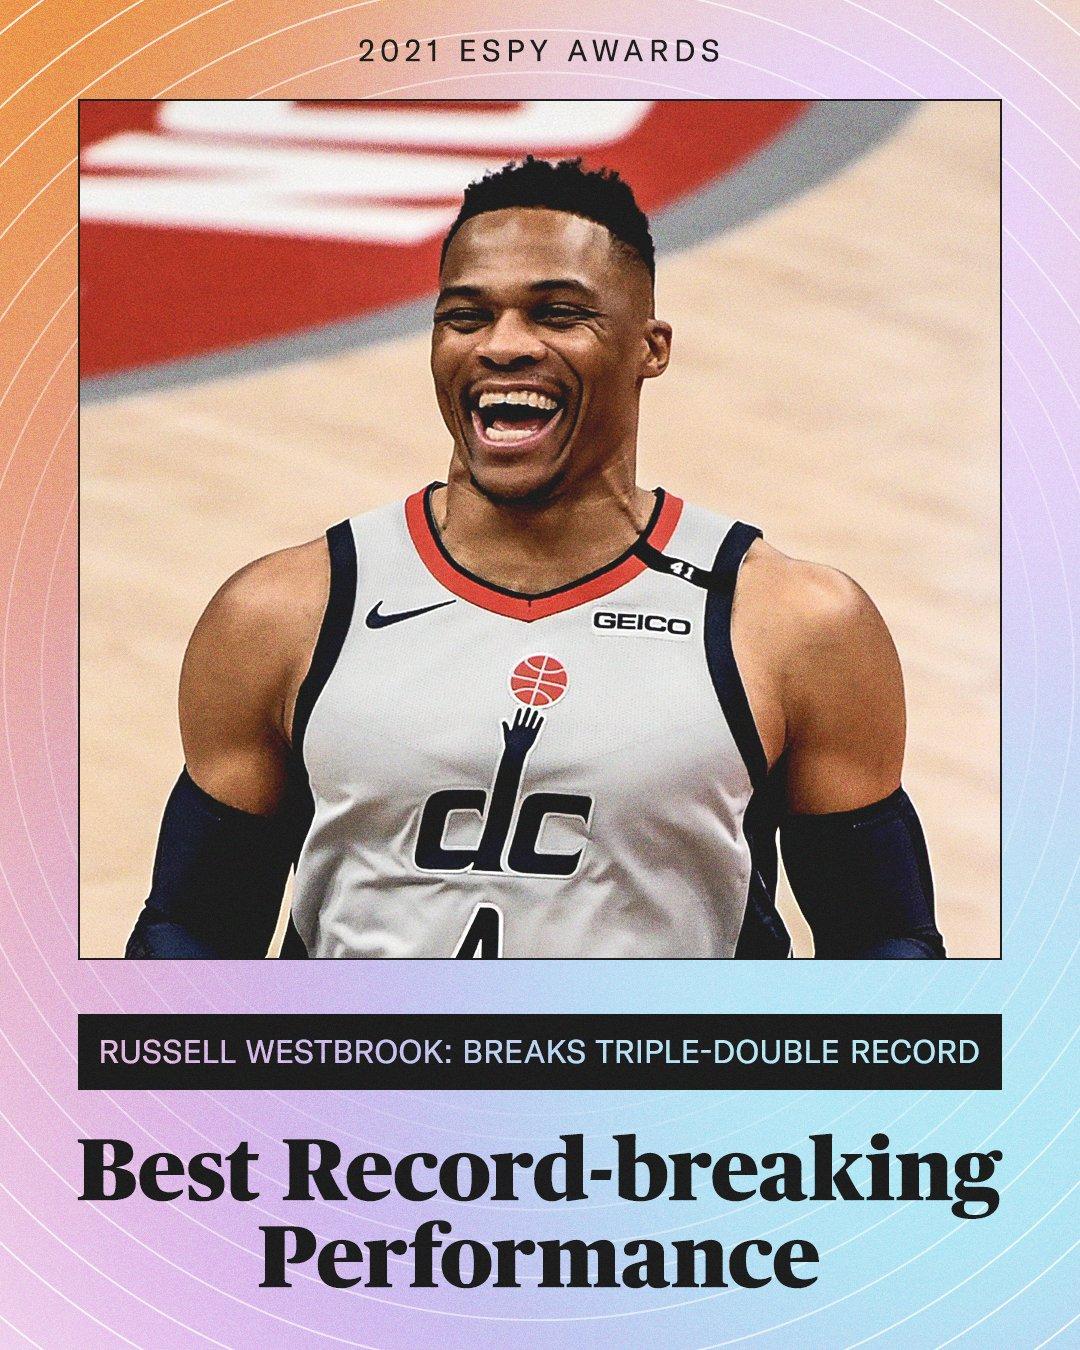 Russell win ESPYS award